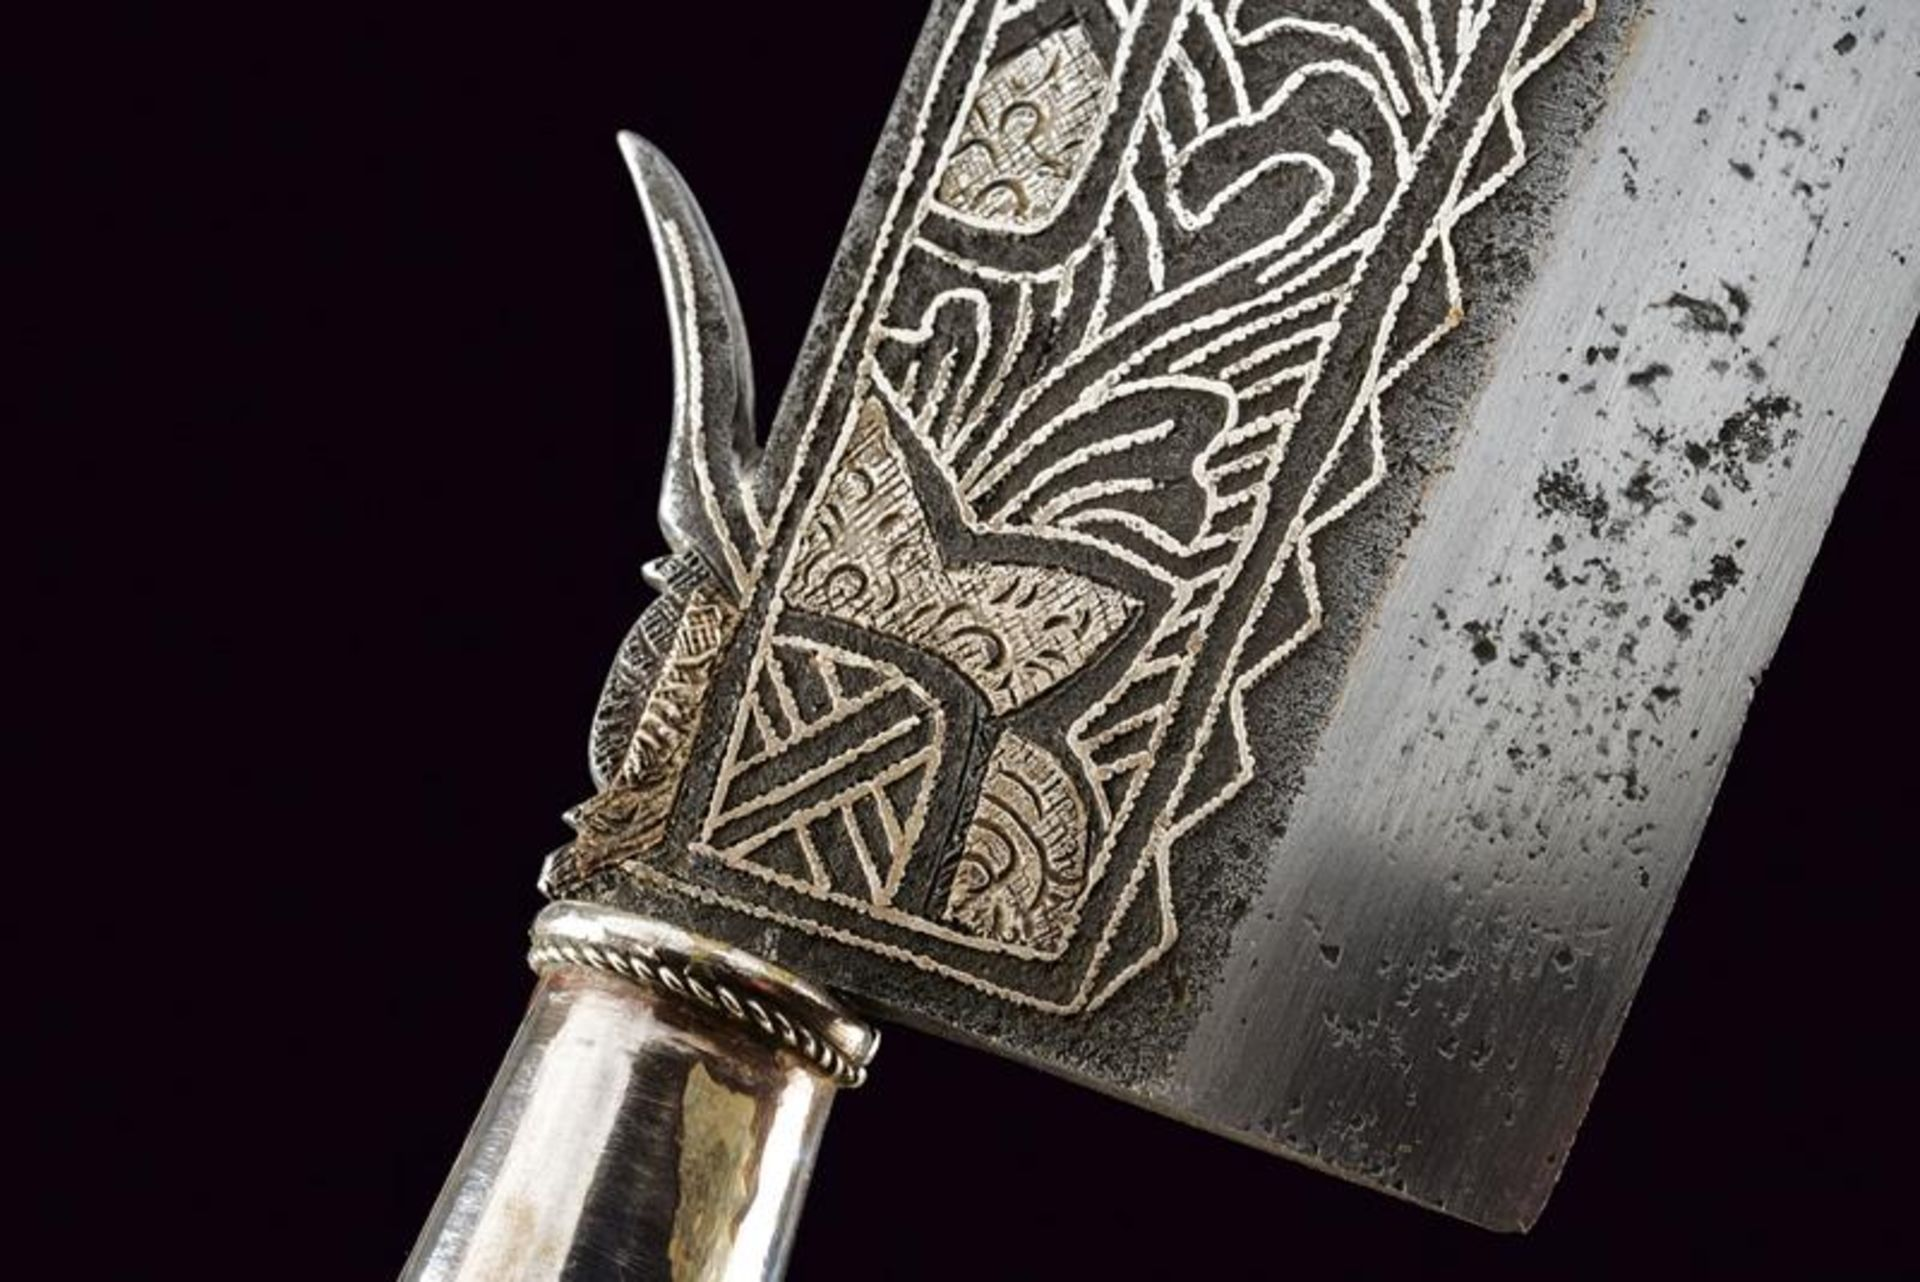 A ceremonial axe with silver hilt - Bild 2 aus 6